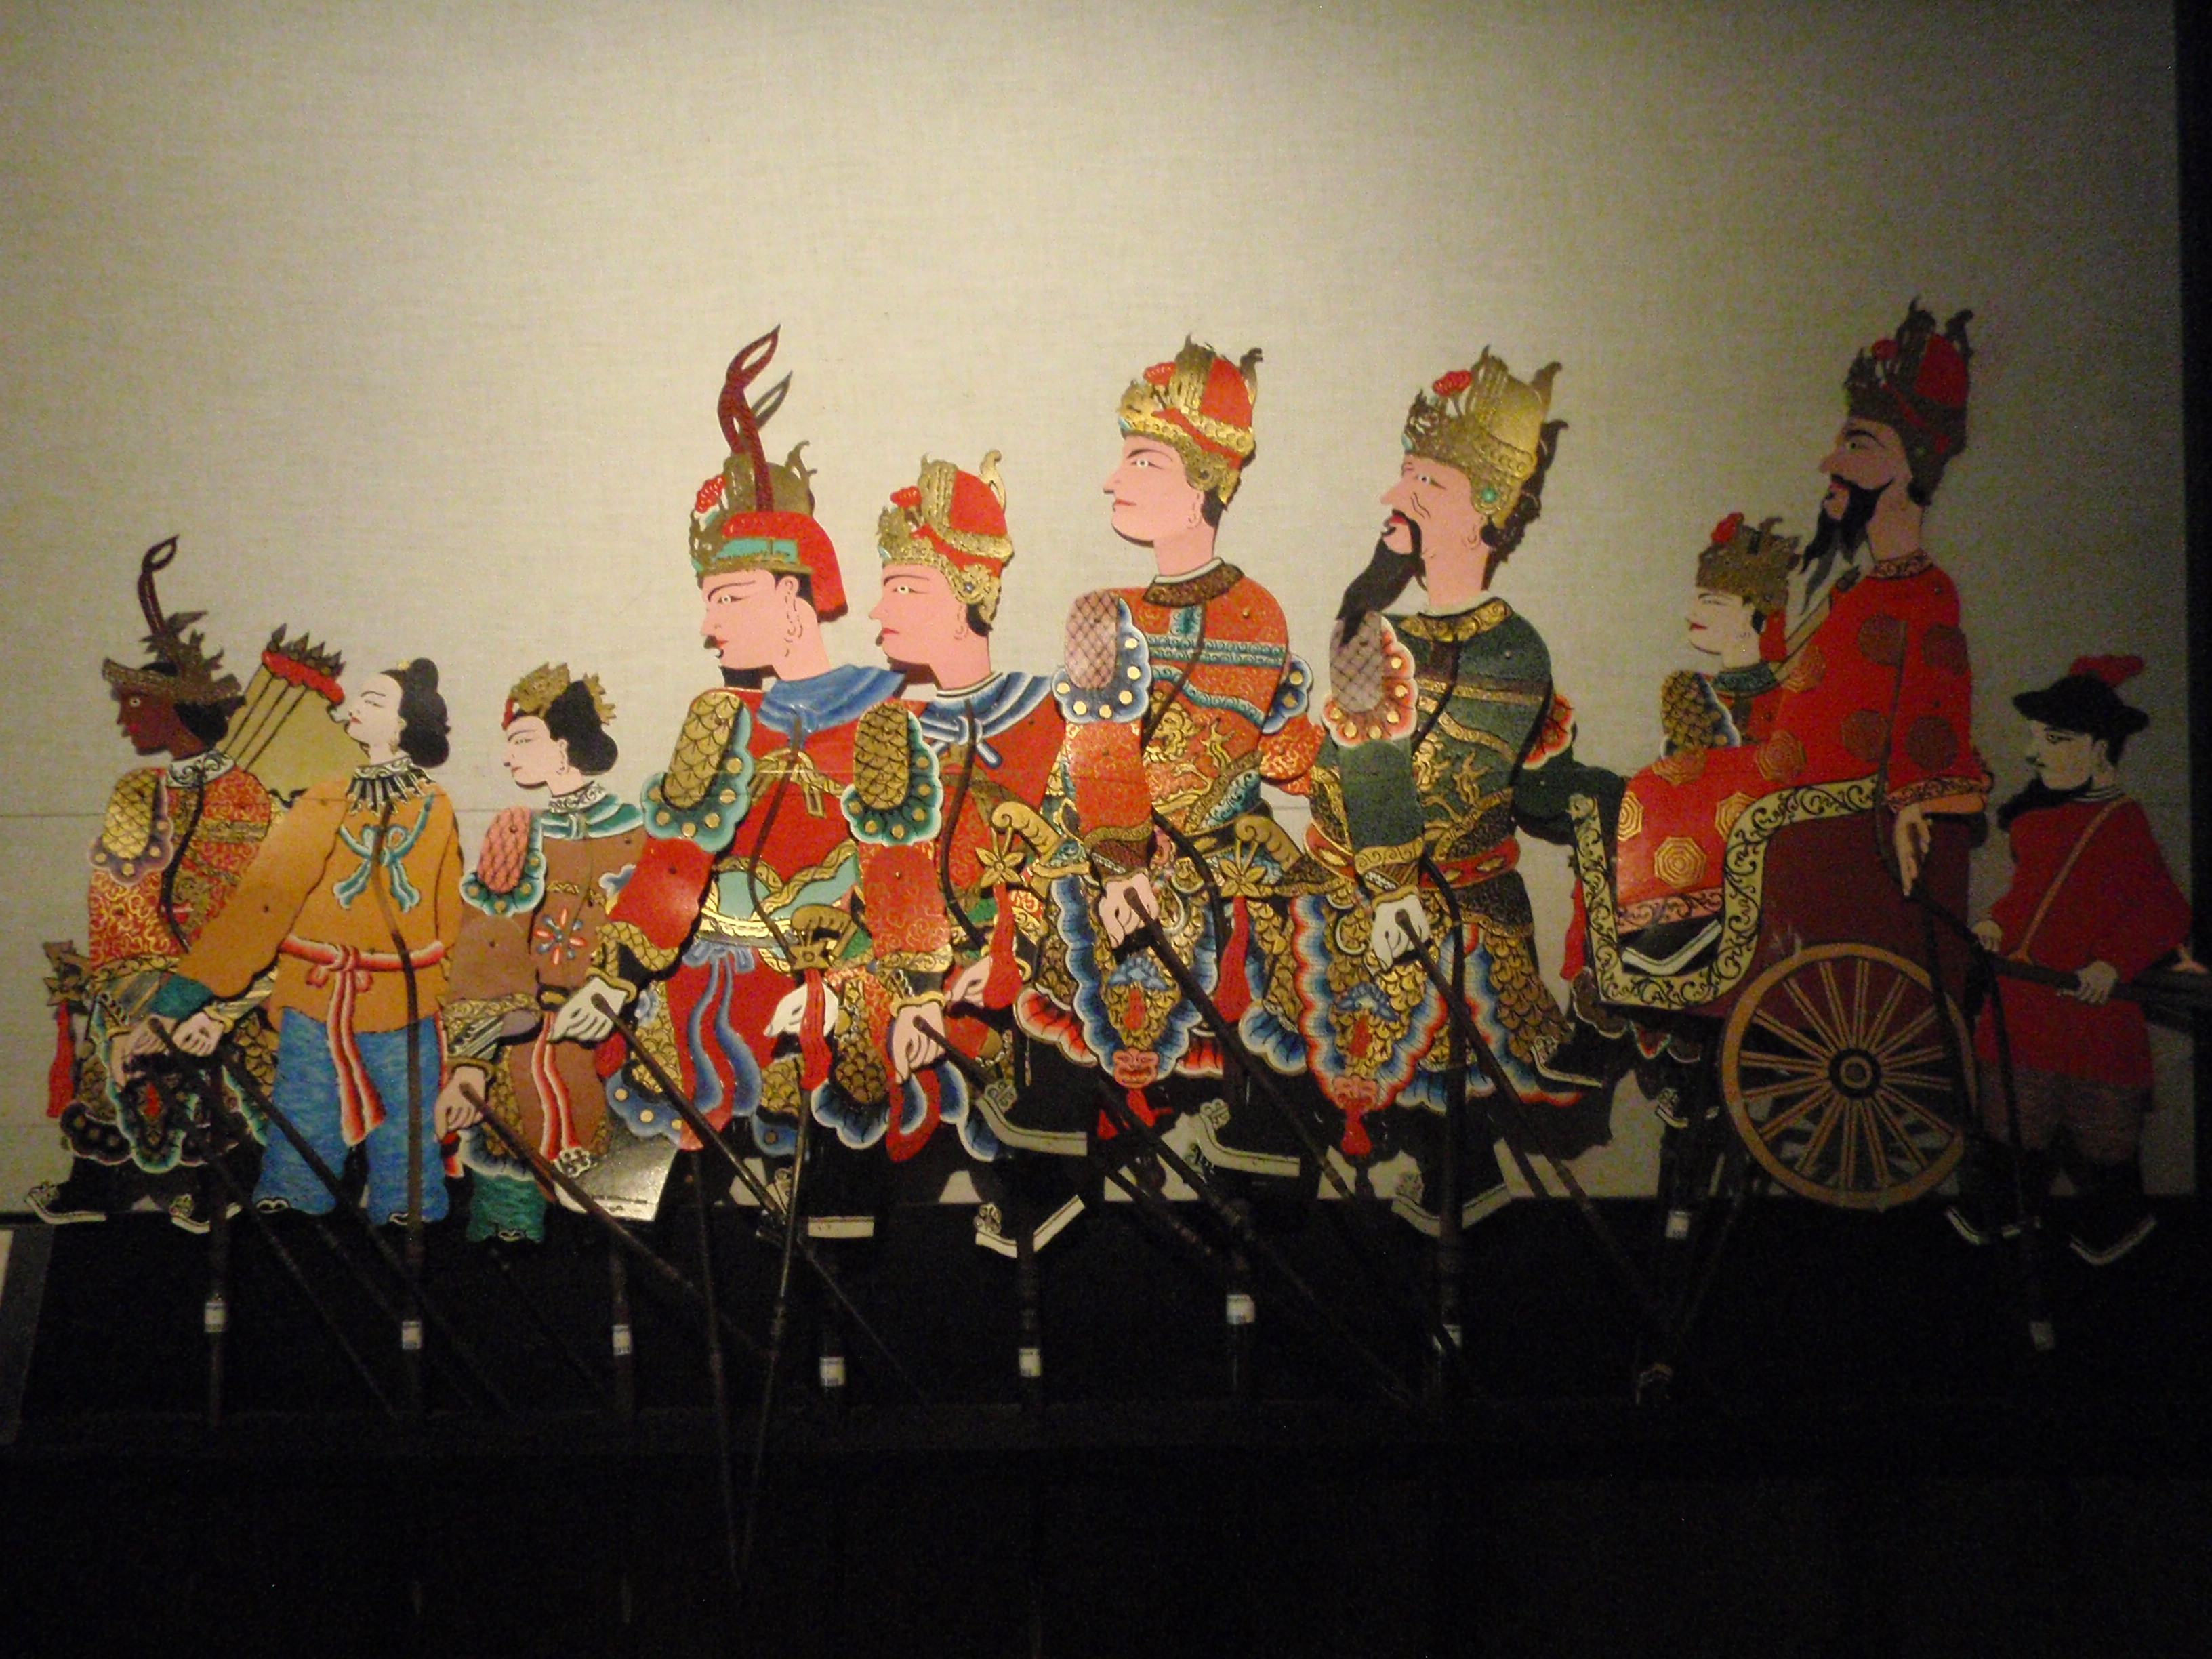 Wayang <em>kulit</em> Tiongkok-<em>Jawa</em> (théâtre d'ombres chinois-javanais), créé en 1885 par Gwan Thwan Sing à Jatineru, Yogyakarta, Java central. Collection : Setia Darma House of Masks and Puppets, Gianyar, Bali, Indonésie.